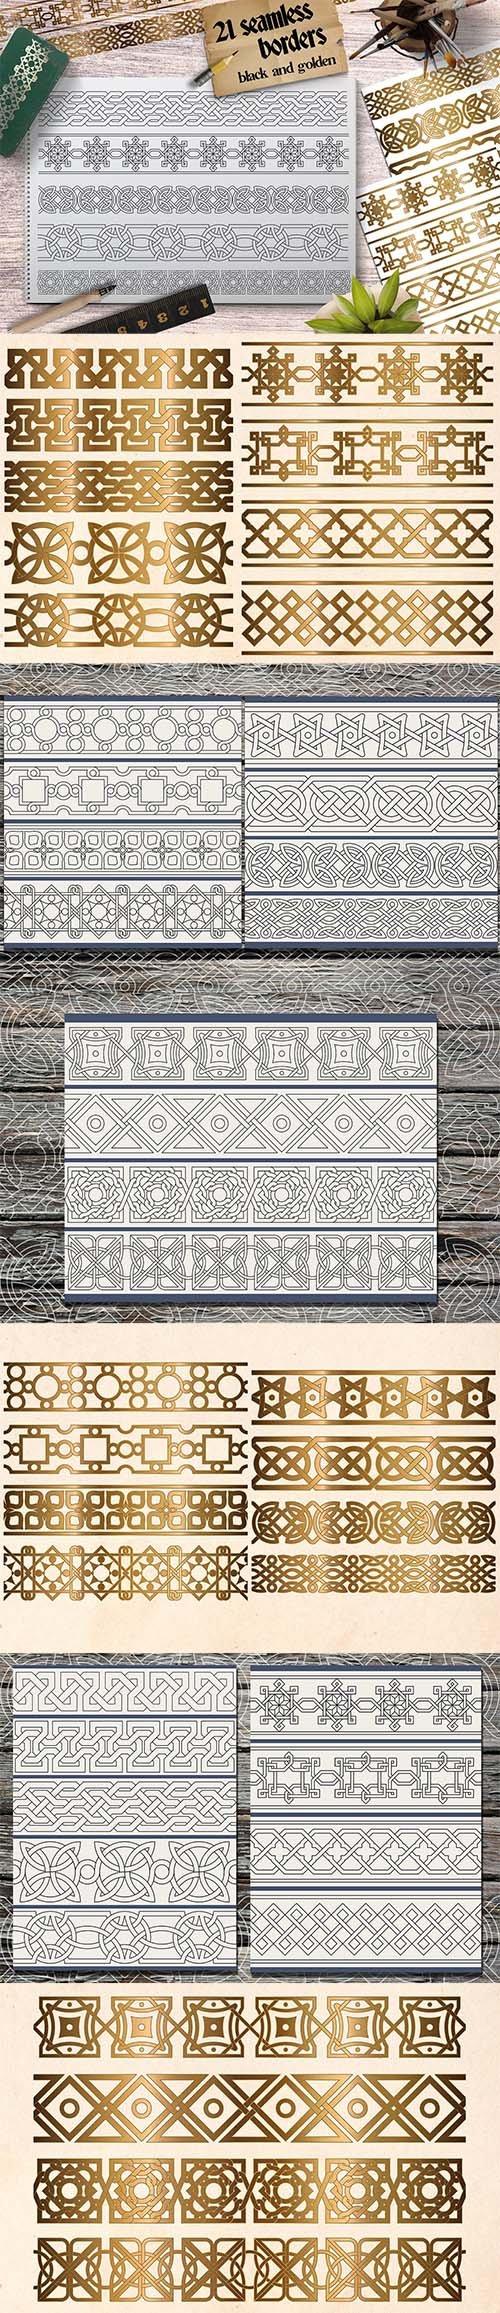 Decorative Seamless Borders